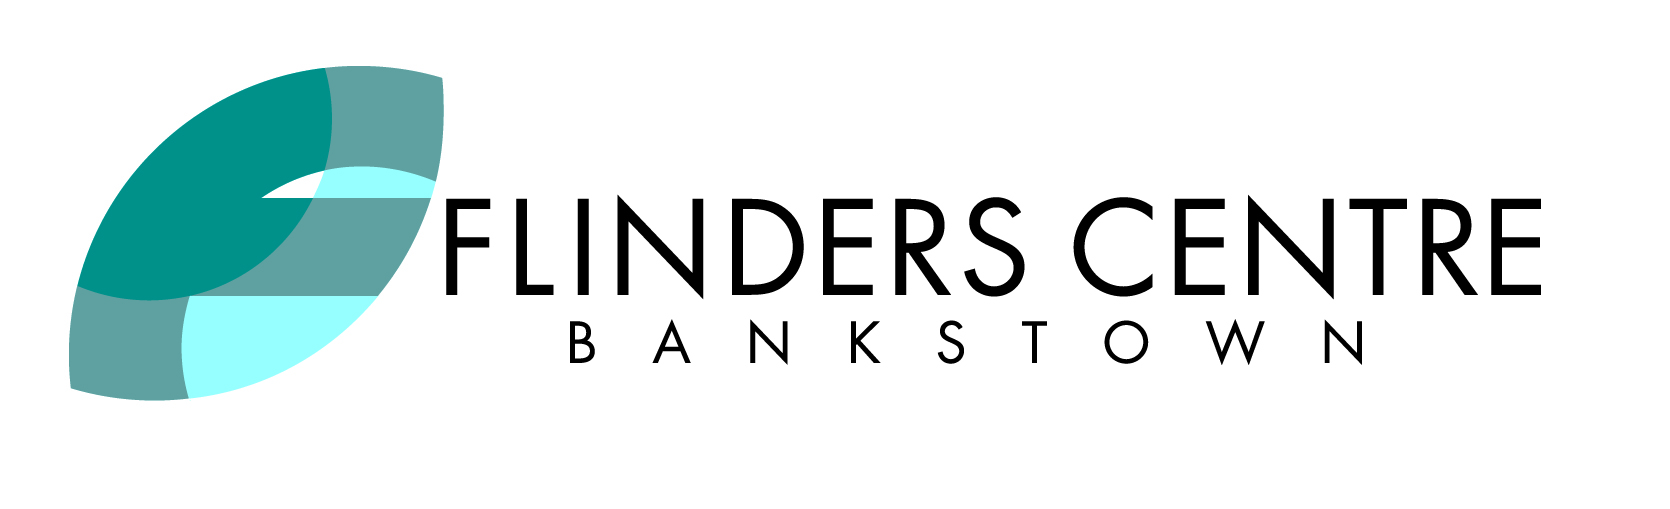 FLINDERS CENTRE logo.jpg